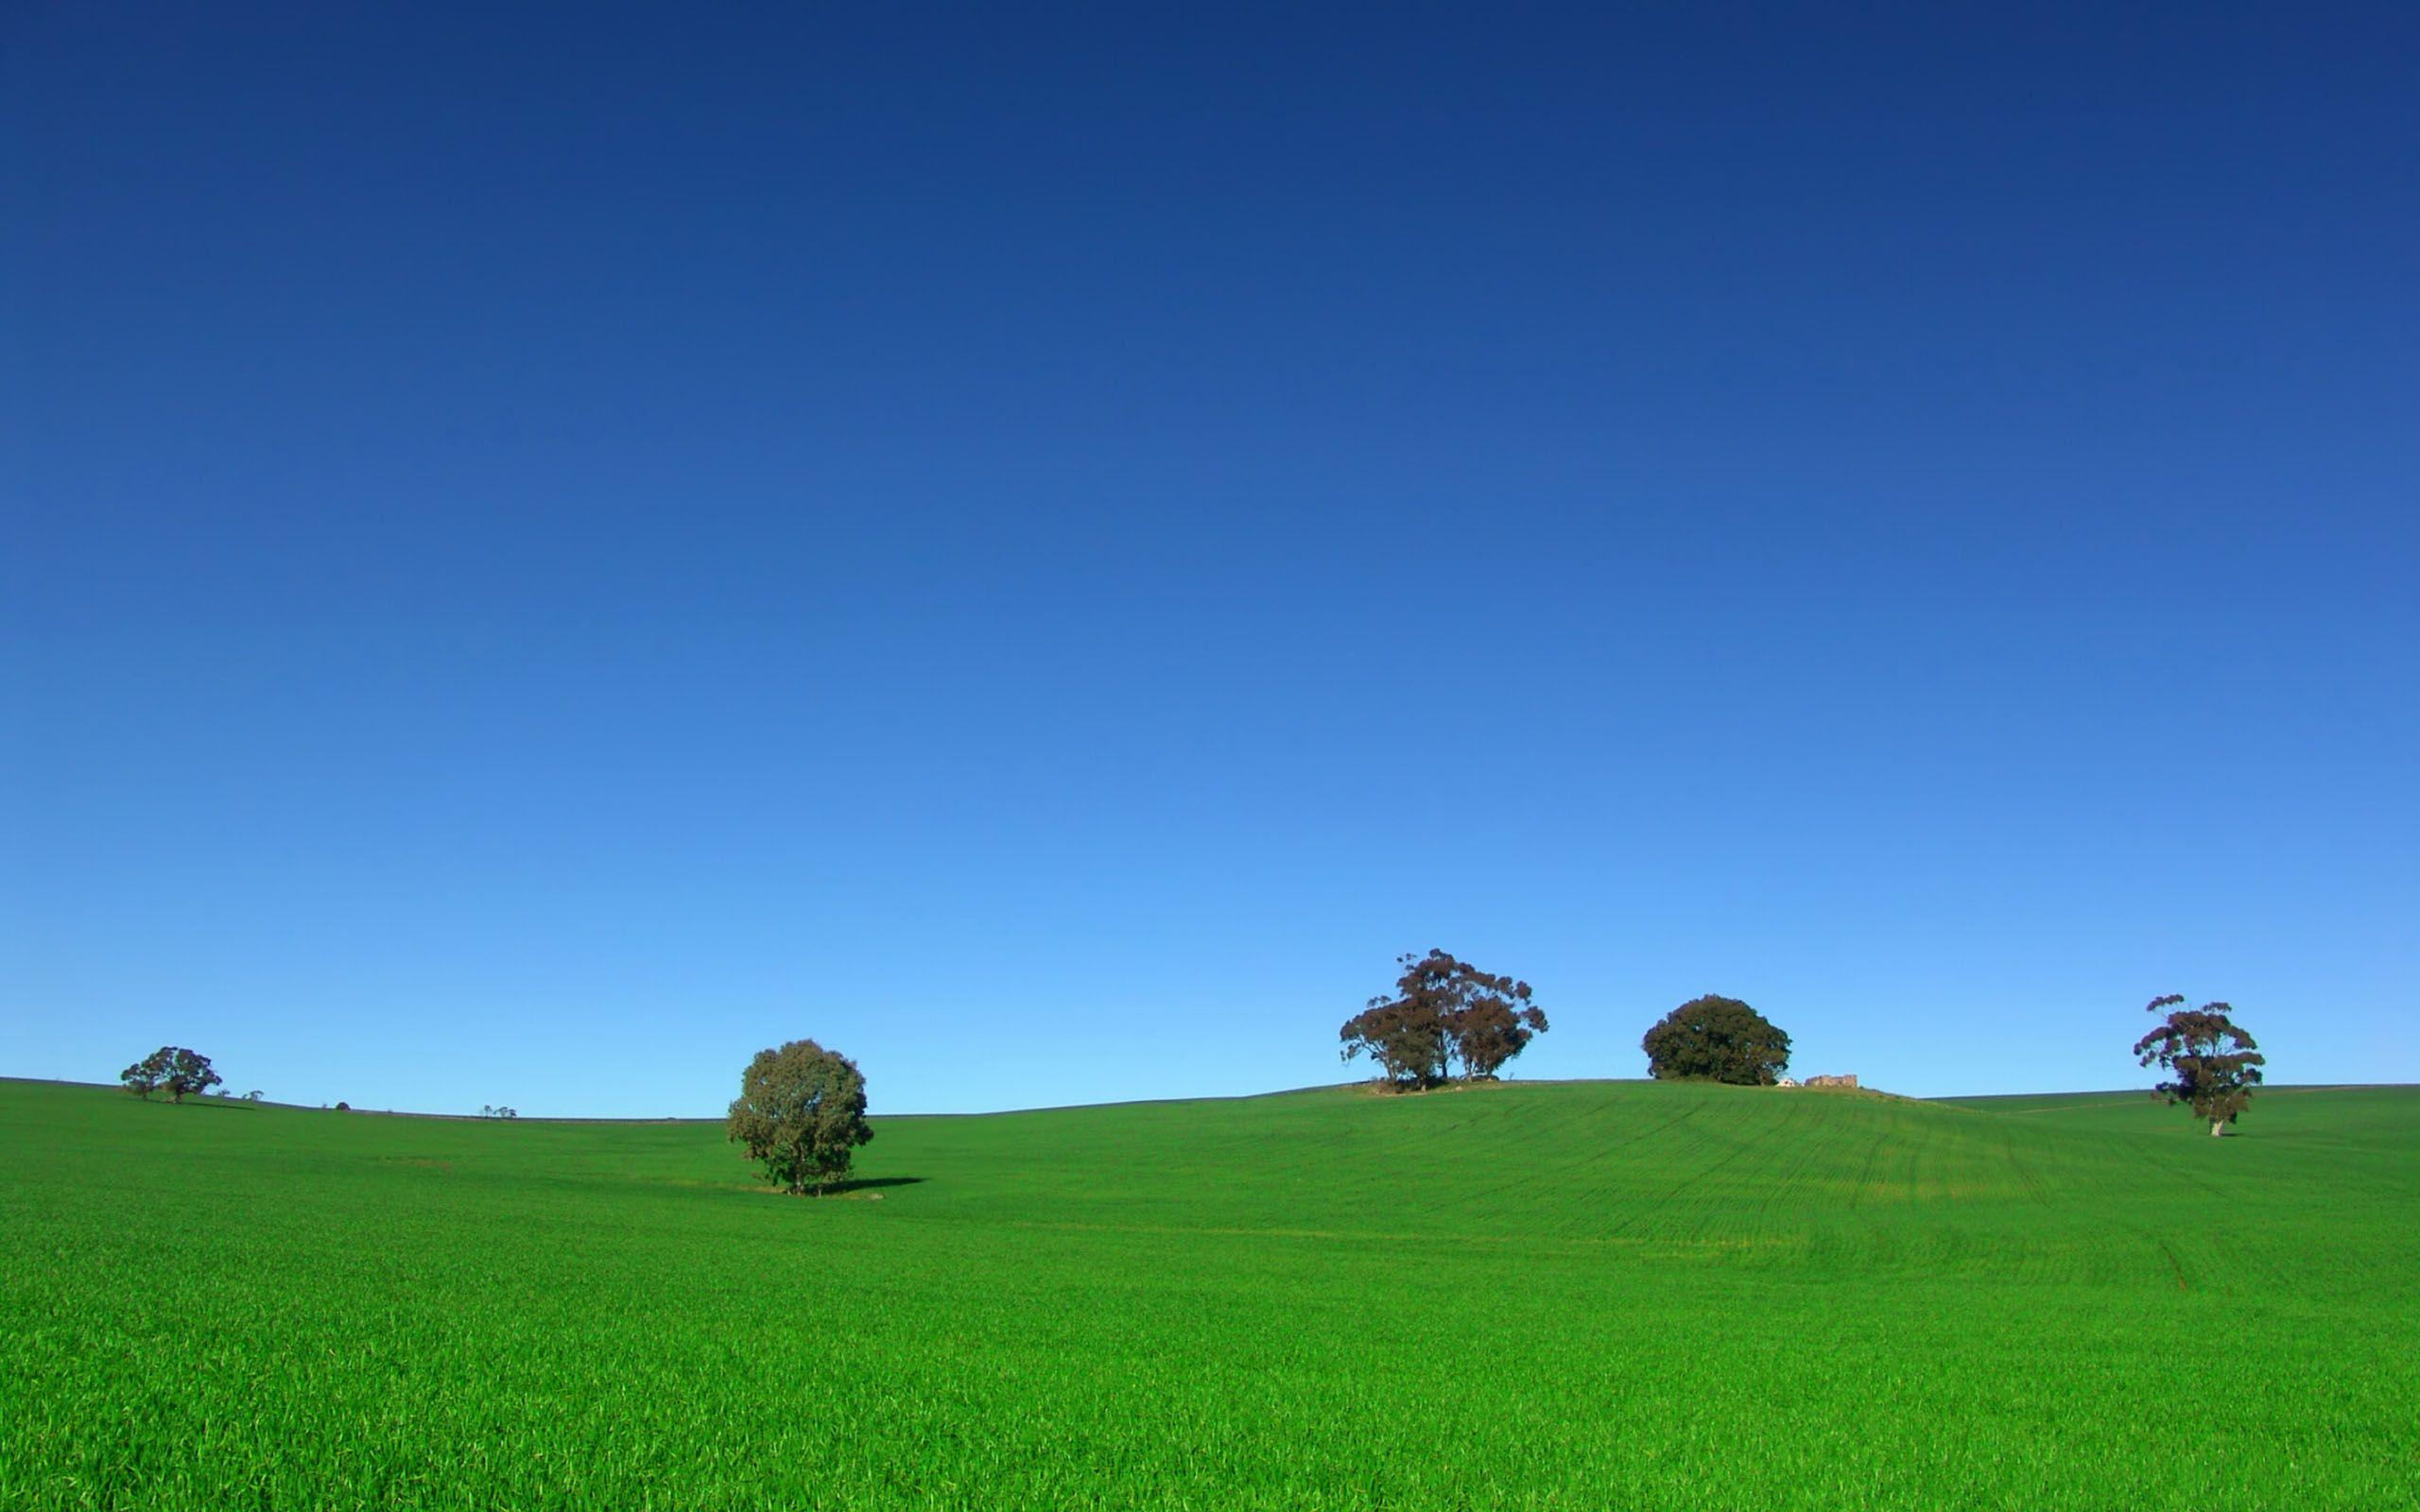 green grass blue sky. view: green grass blue sky r - prashanti.co